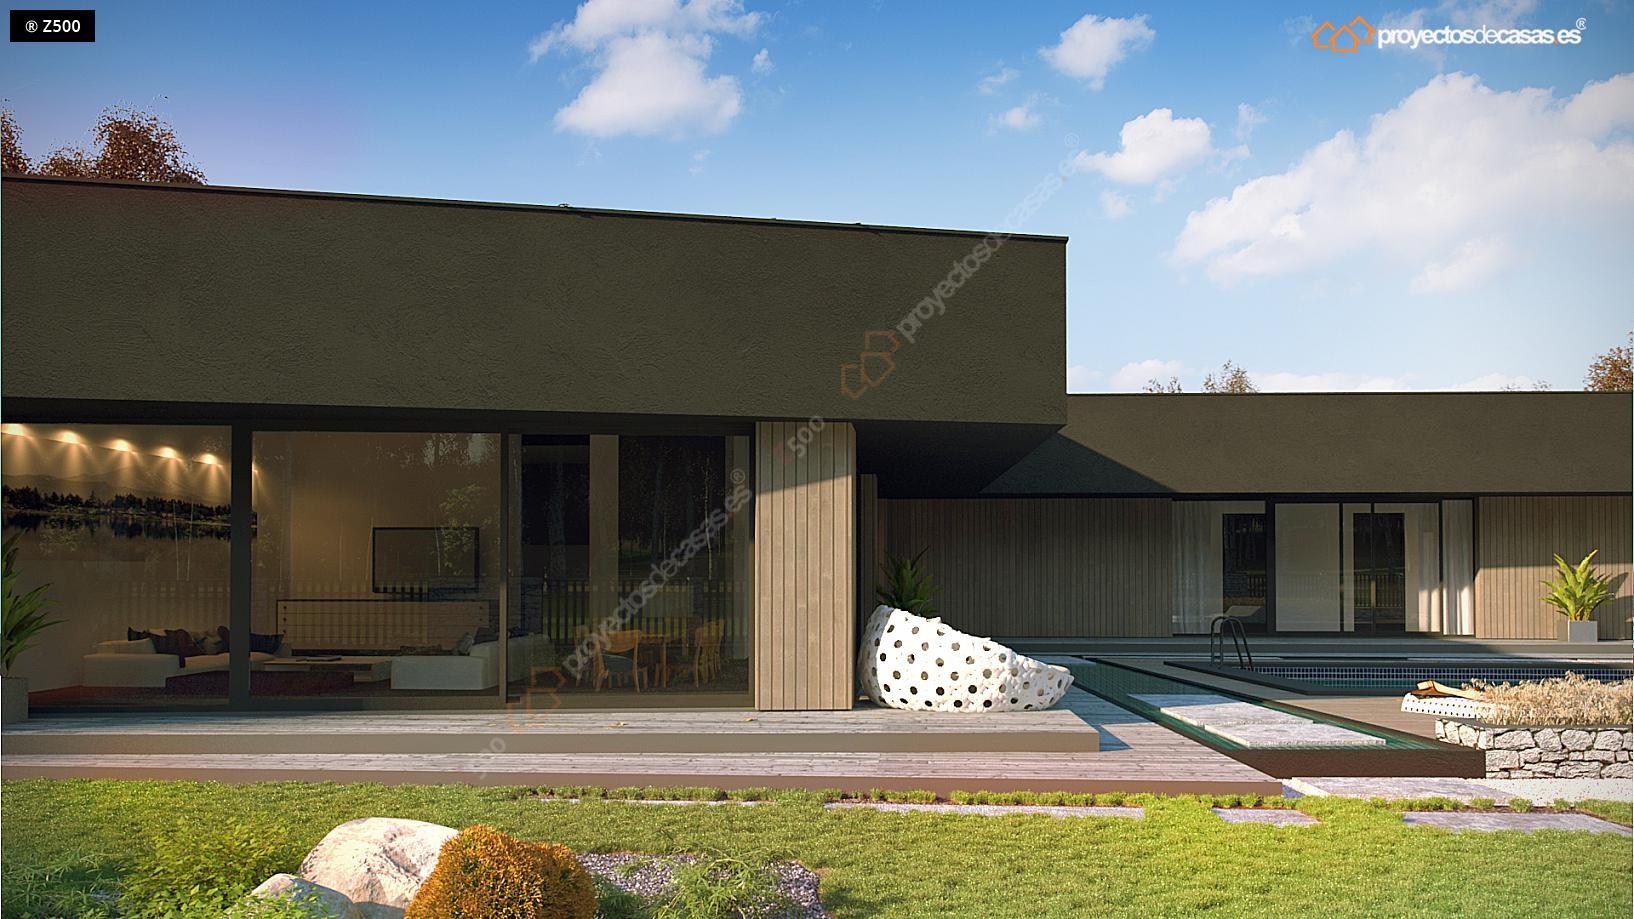 proyectos de casas casa minimalista proyectosdecasas